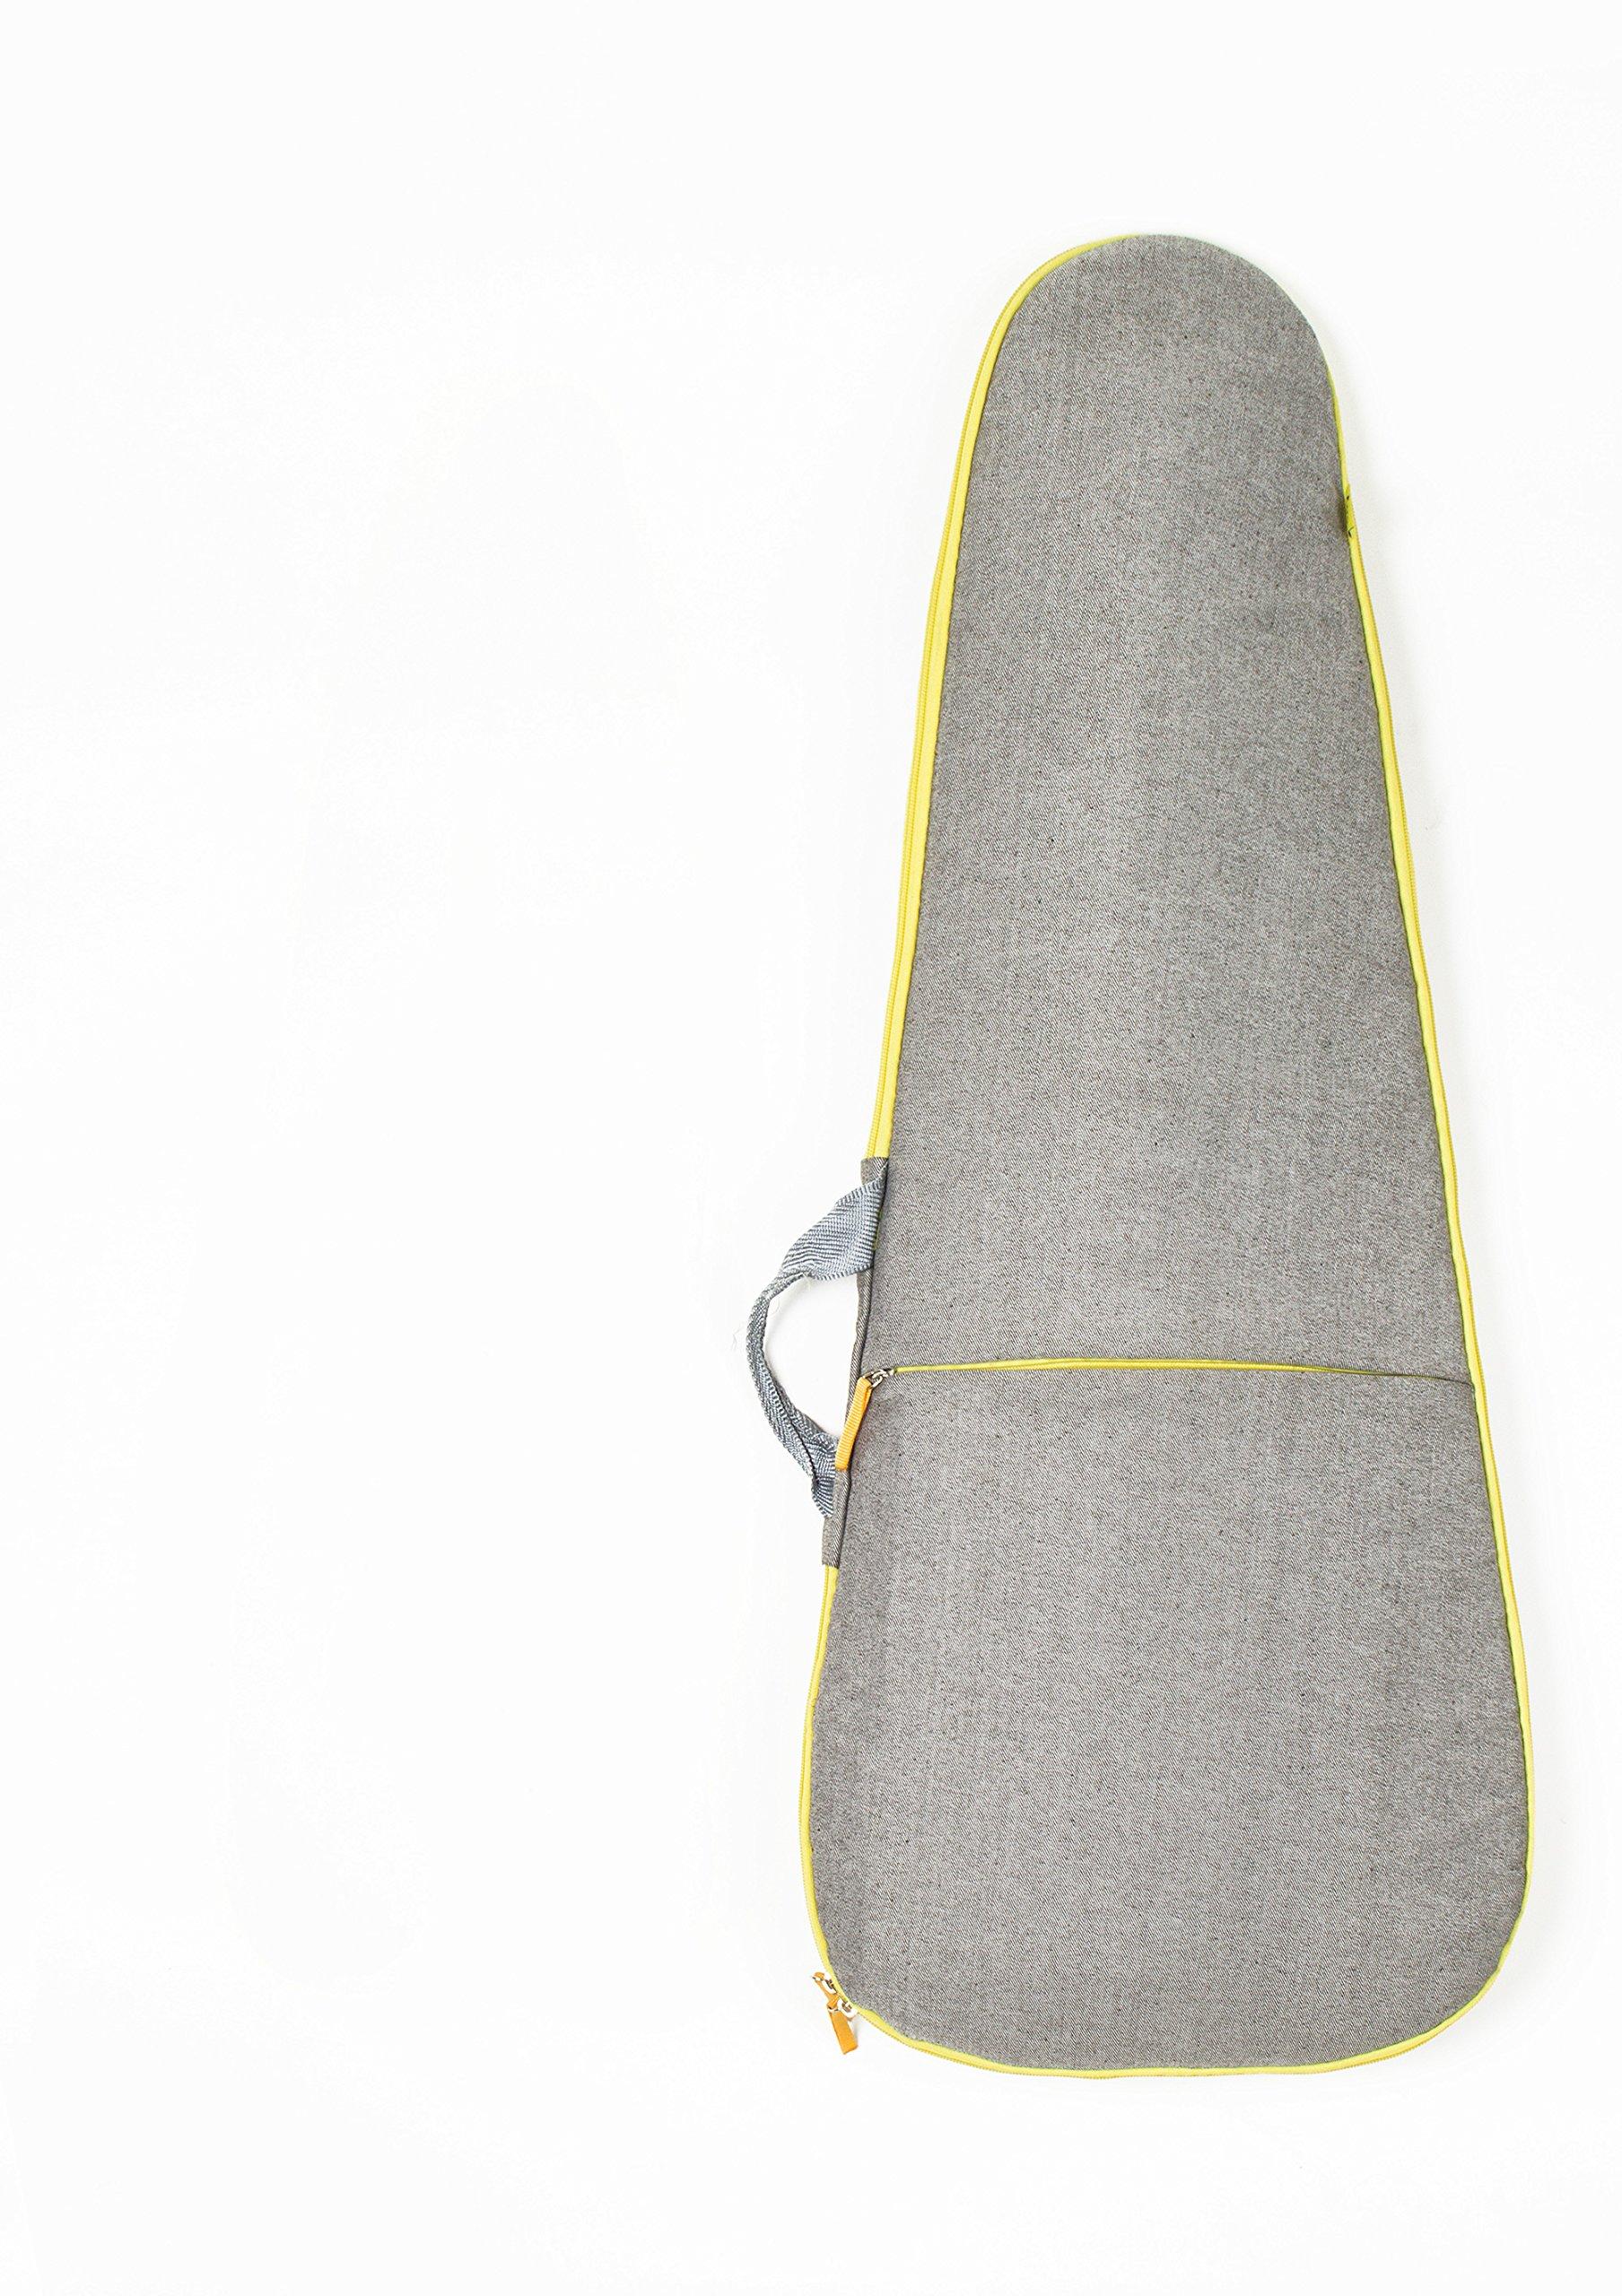 Loog Acoustic Guitar Bag (LGGBG)